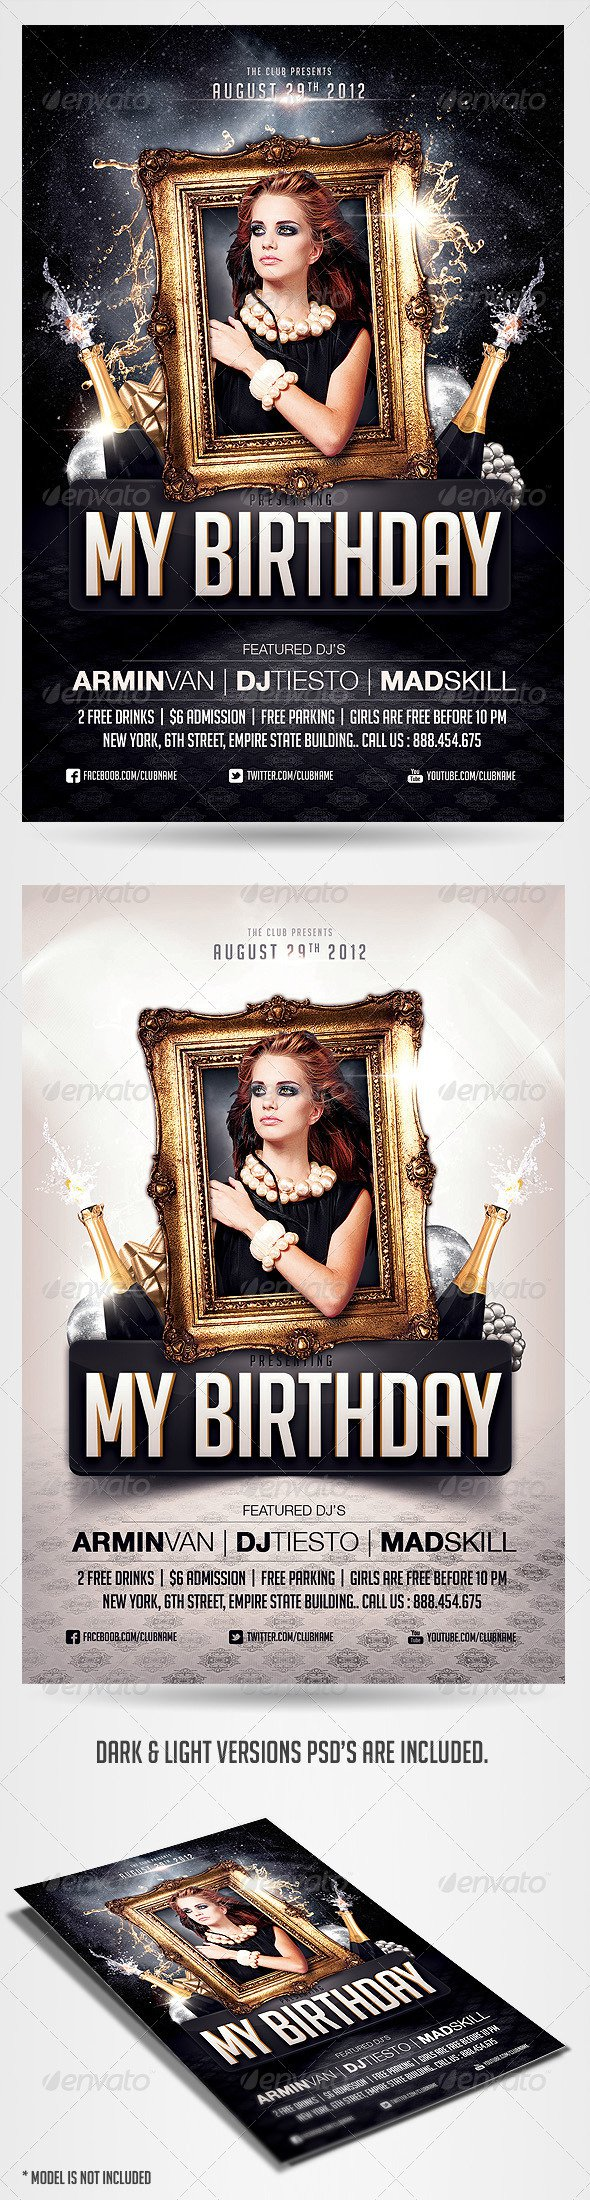 Free Birthday Party Invitation Templates Photoshop